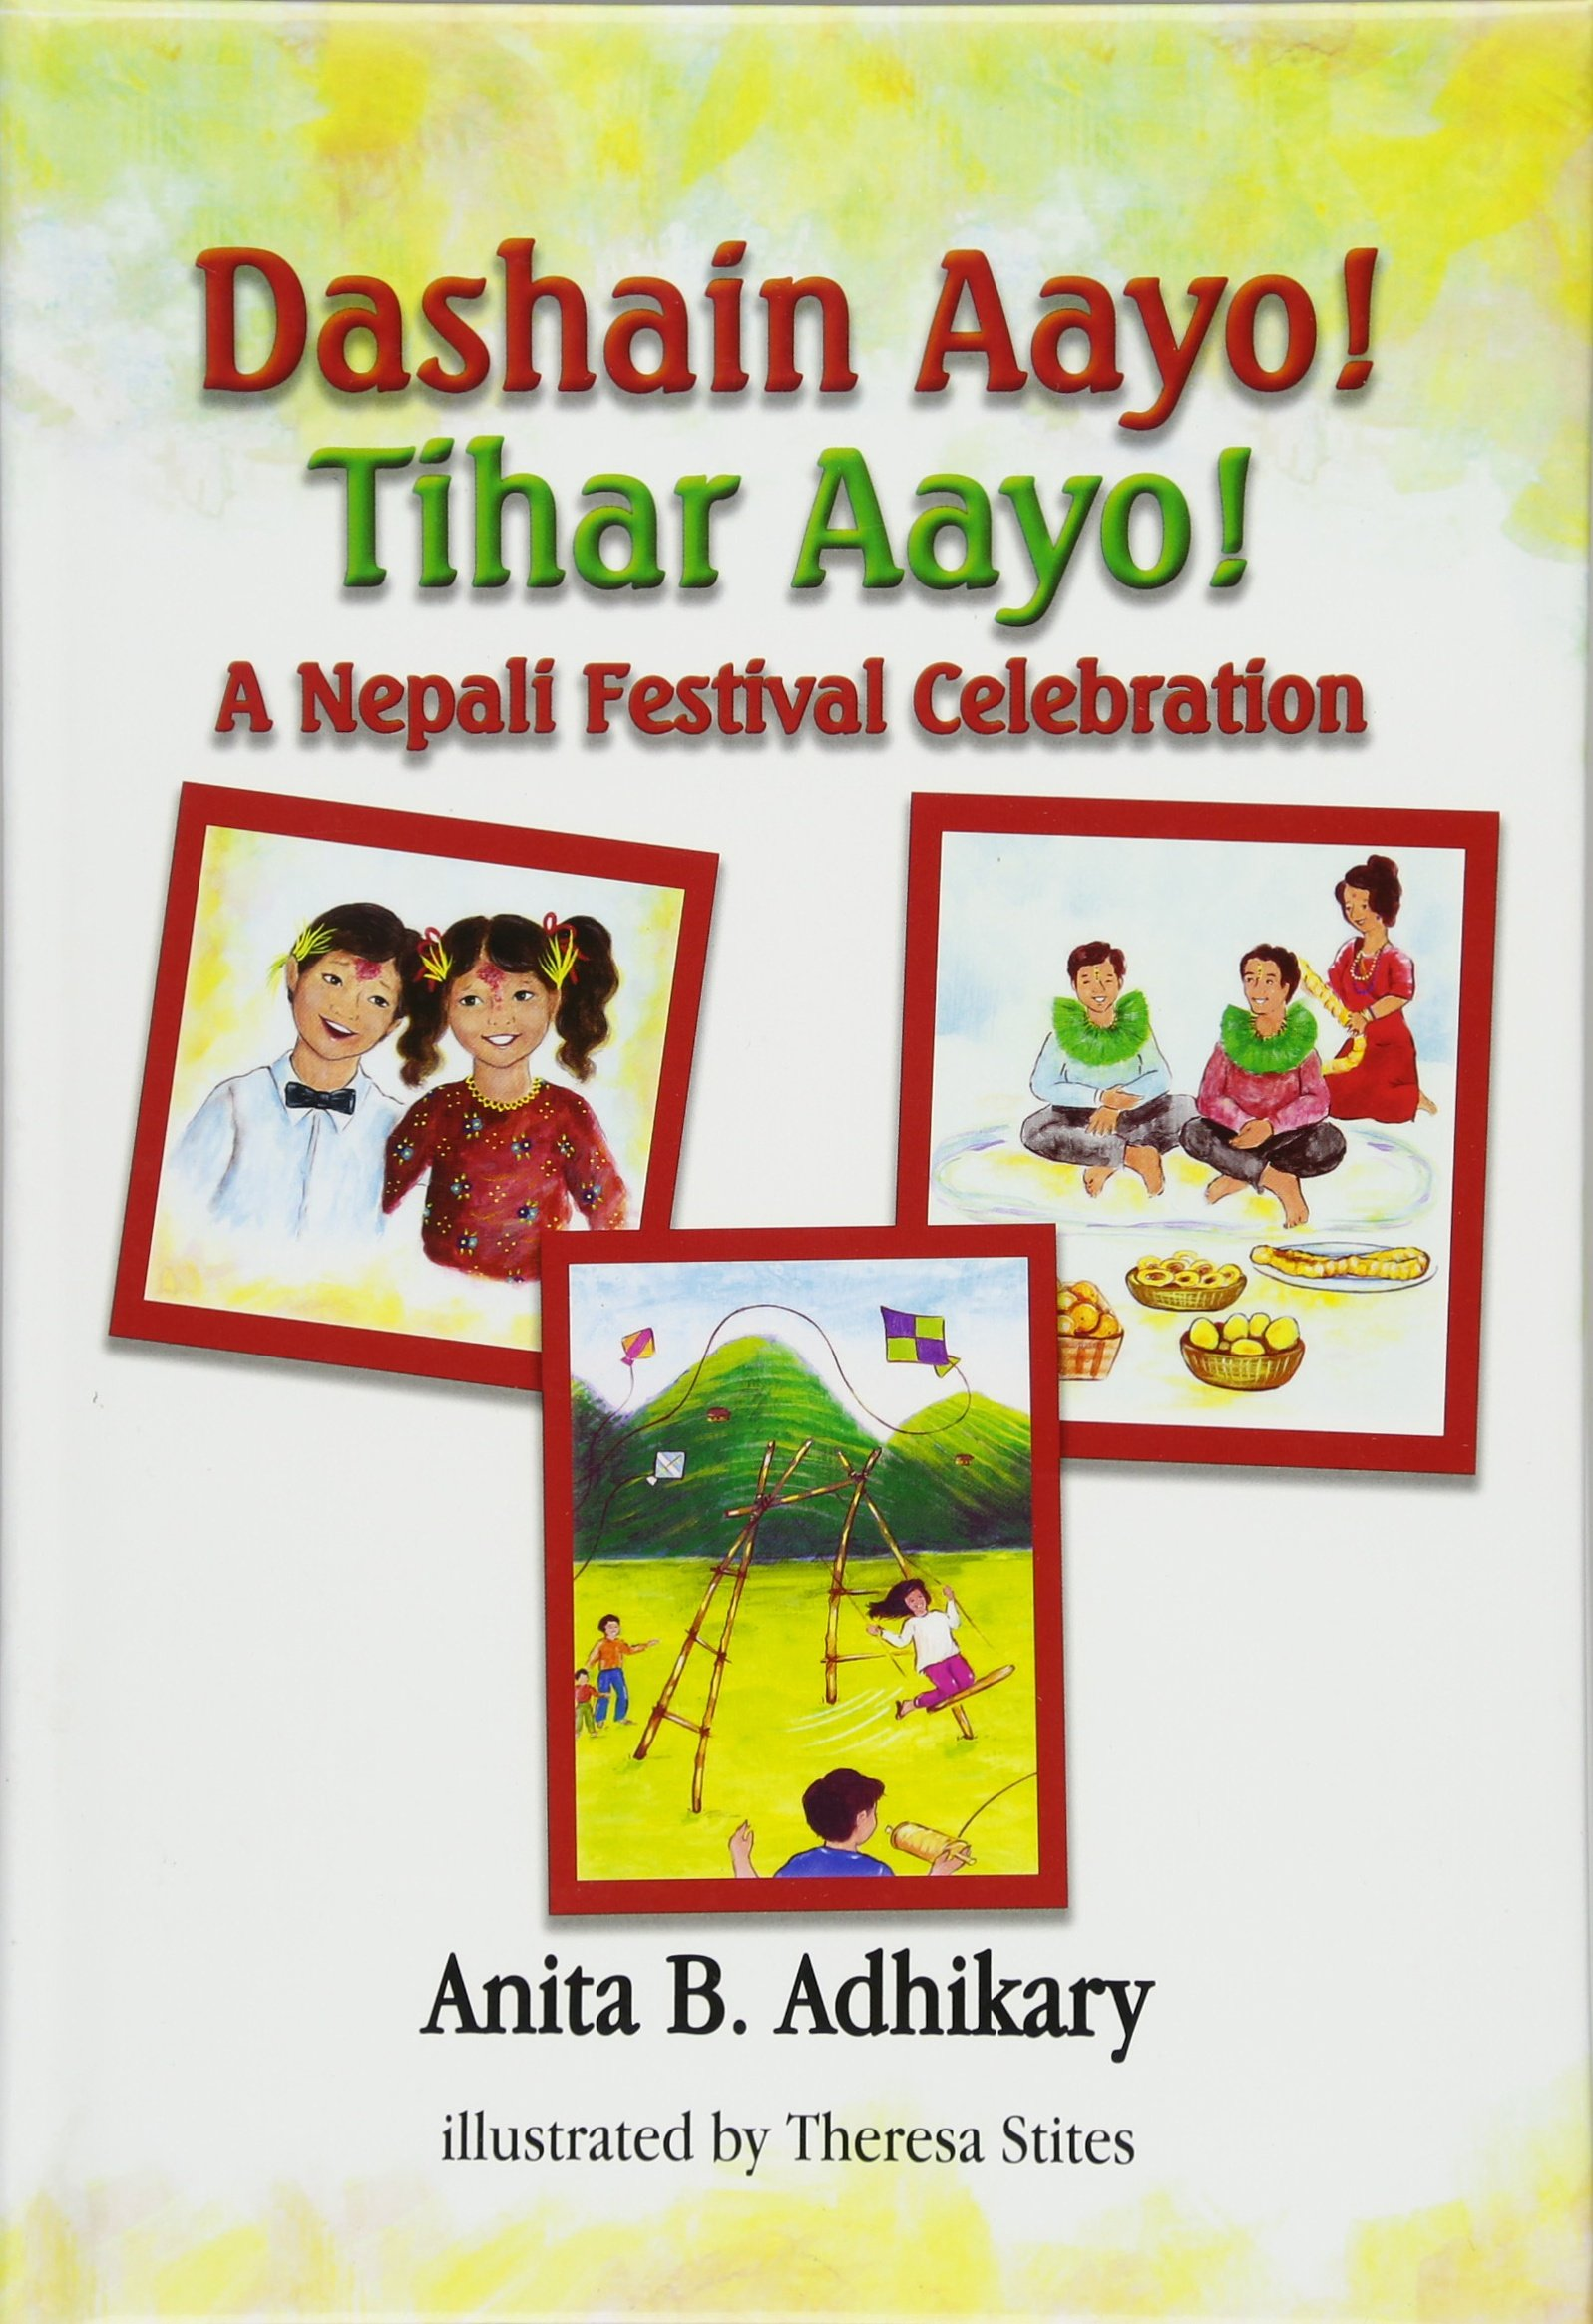 Dashain Aayo Tihar Aayo A Nepali Festival Celebration Anita